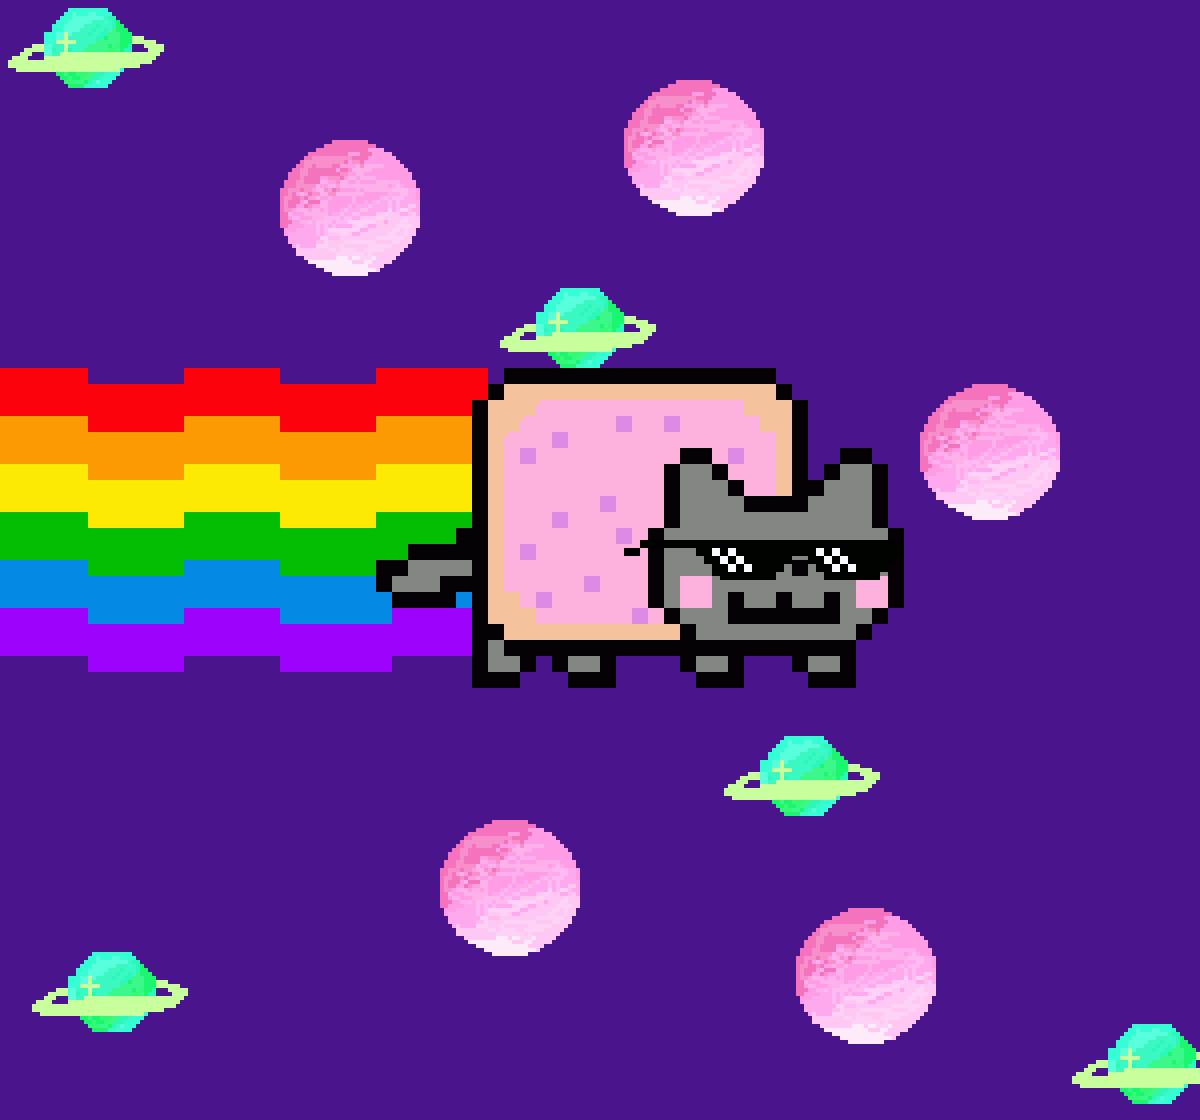 Cool Cat by ArtLoverIris